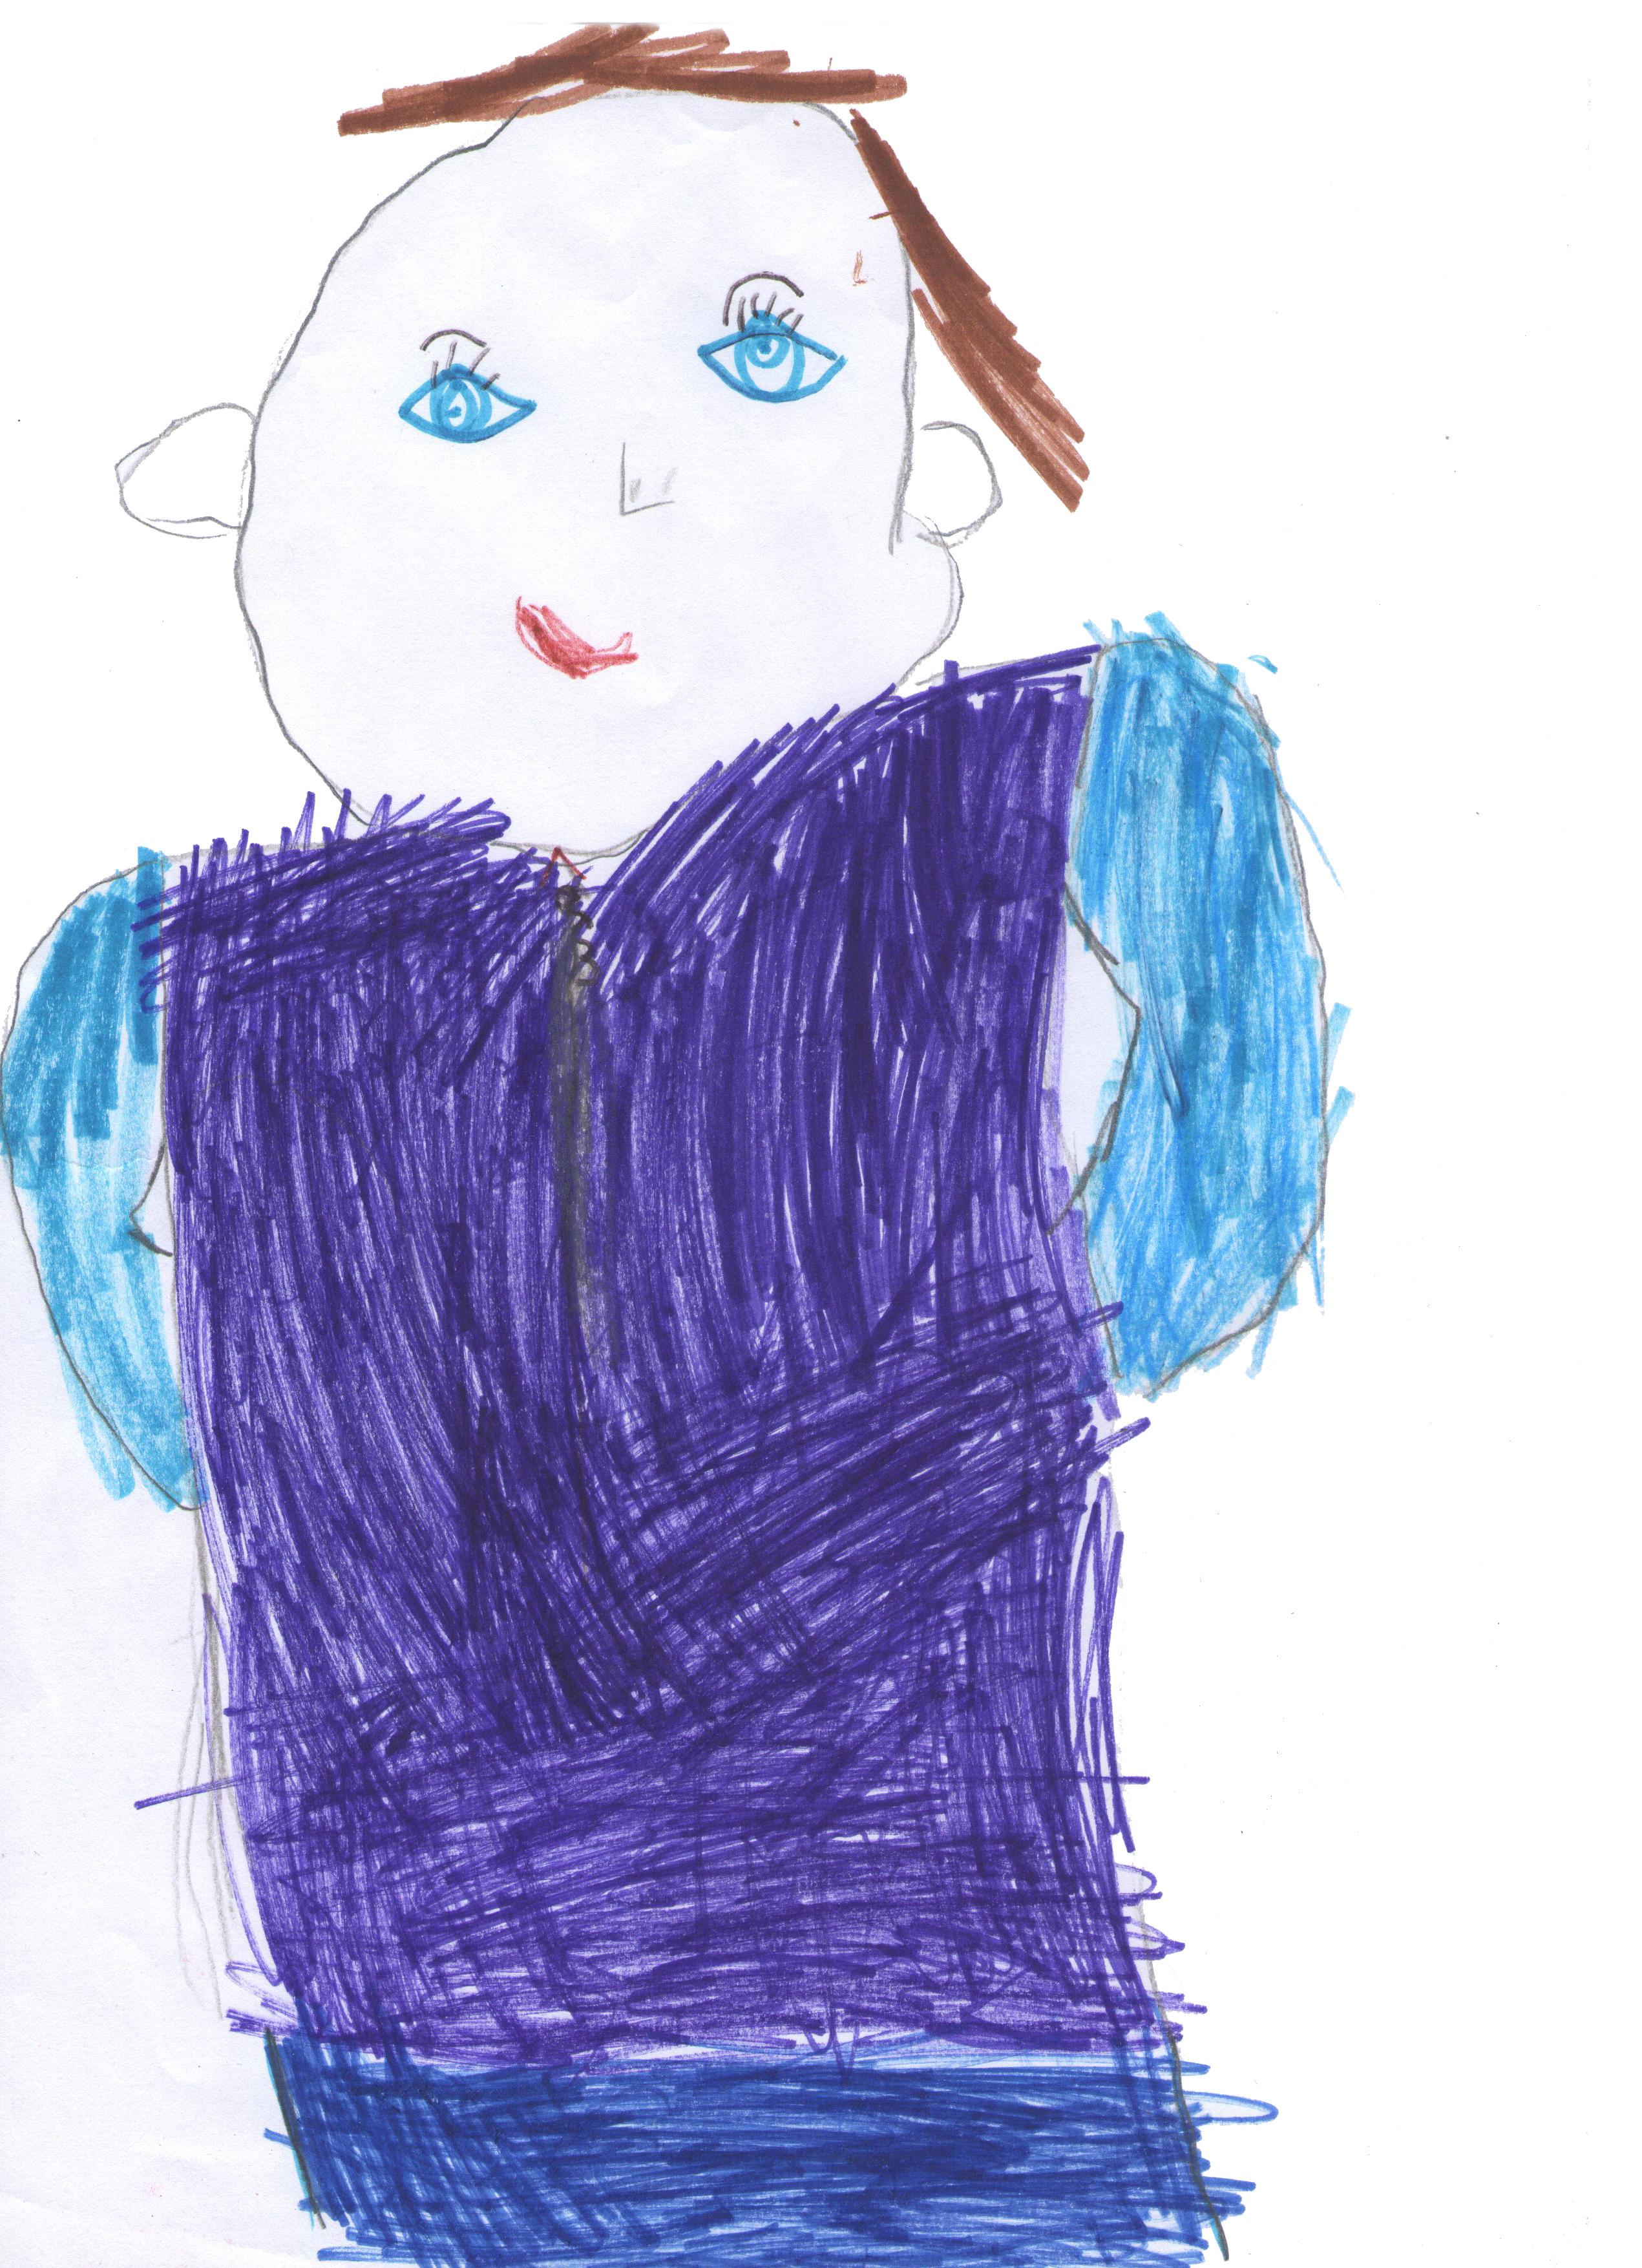 Gambar Gambar Sketsa Ilustrasi Mode Seni Anak Desain Busana